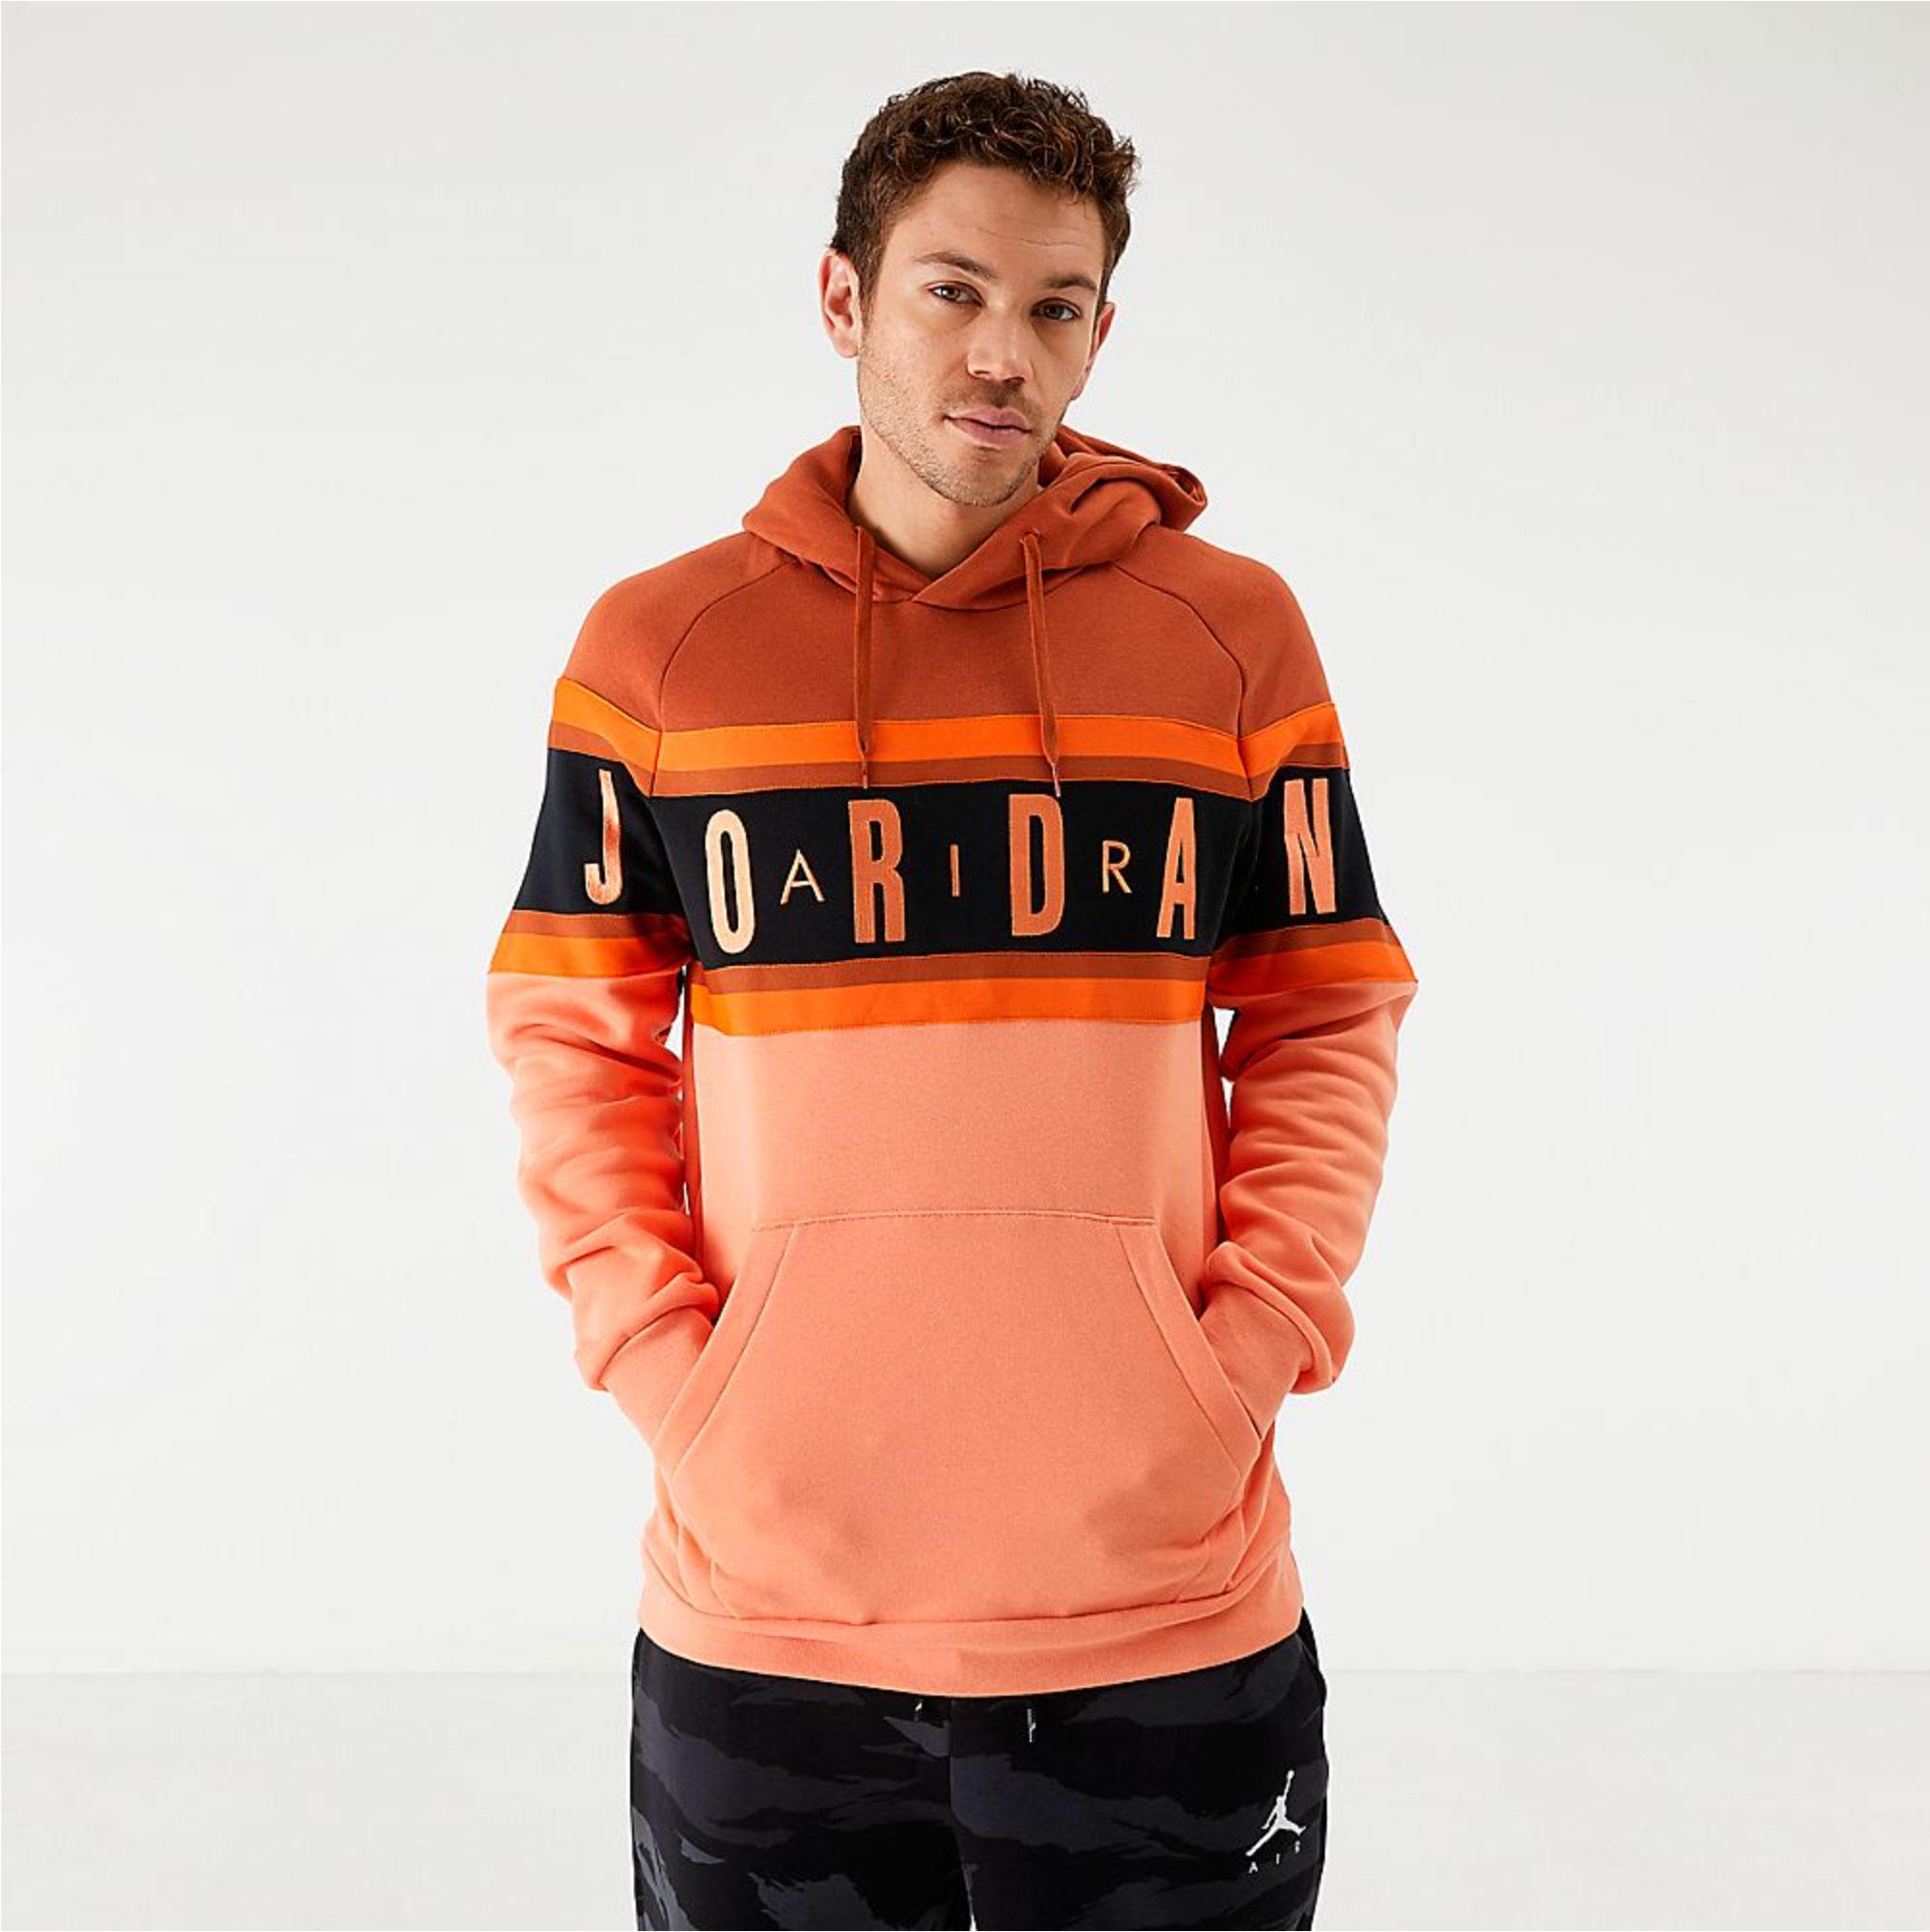 jordan-1-shattered-backboard-matching-hoody-2